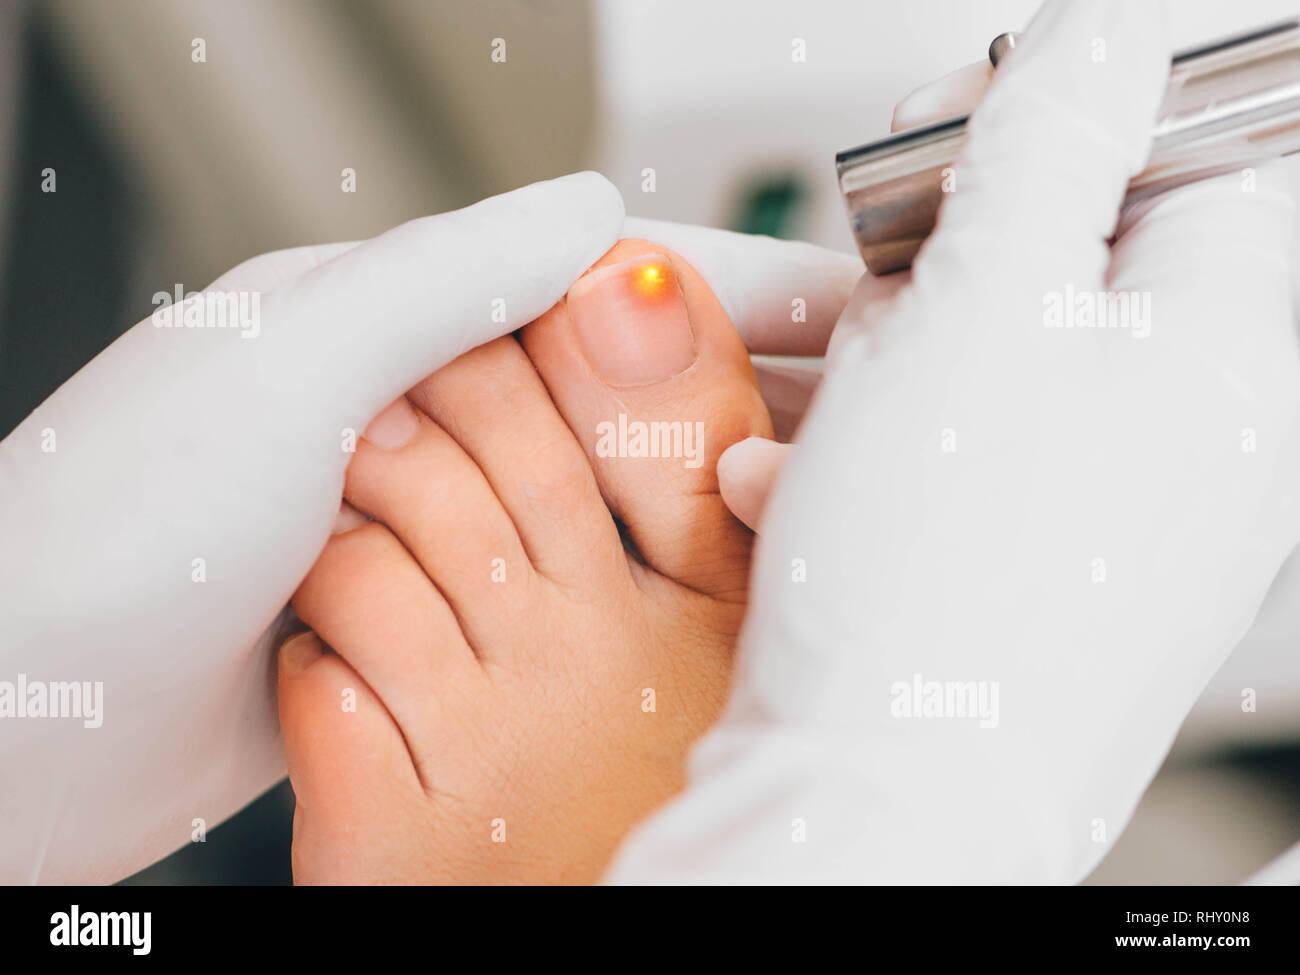 laser treatment on toenail, fungal infection on the toenails - Stock Image